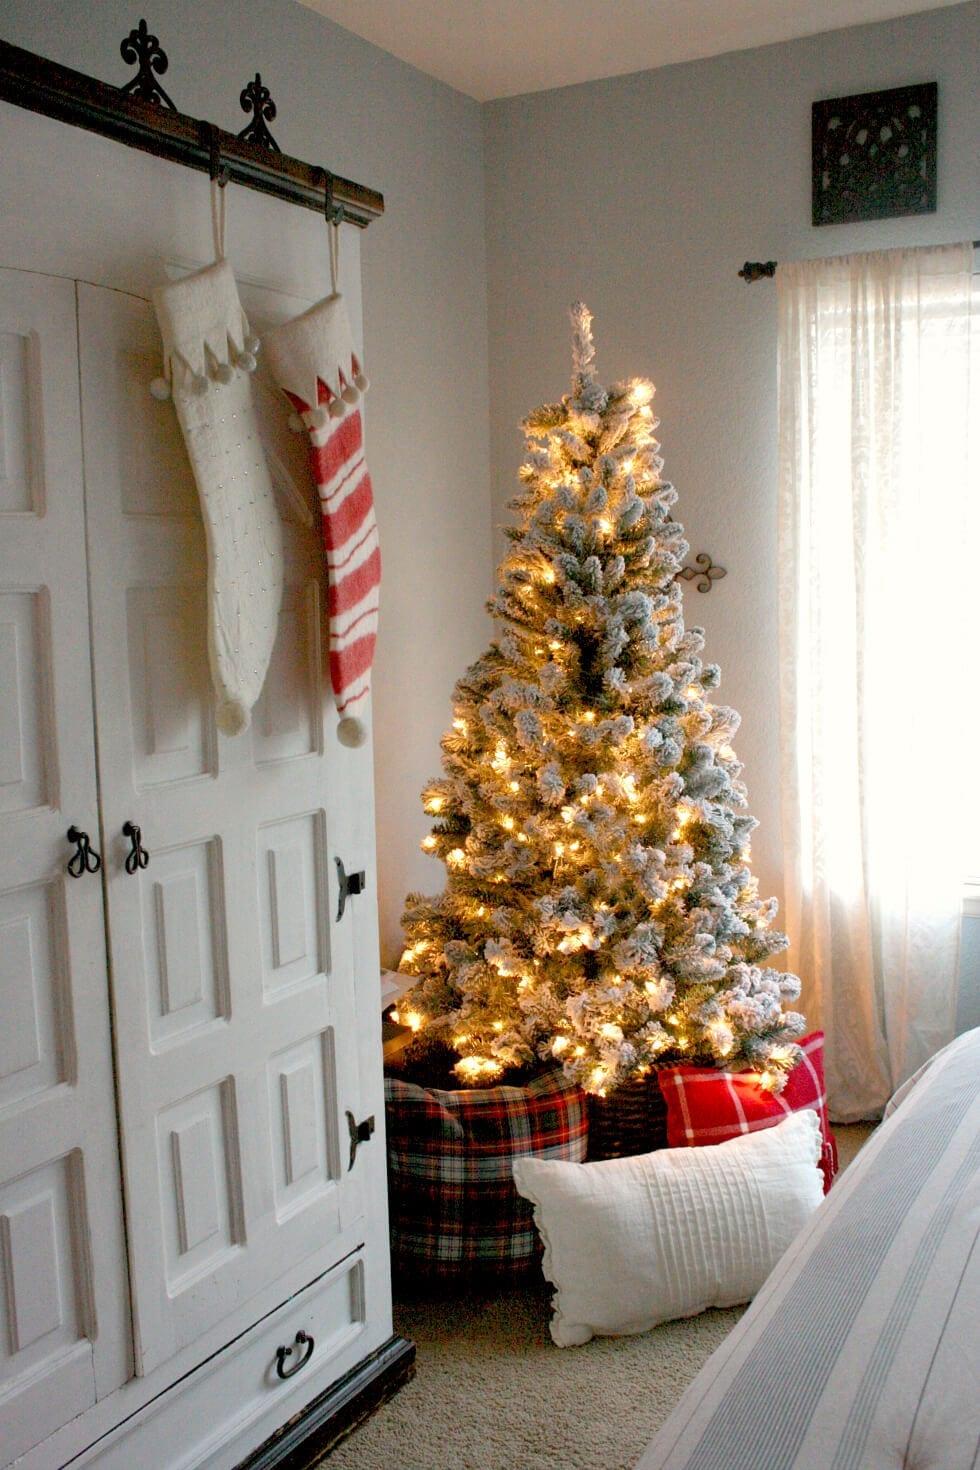 A cozy Christmas bedroom!